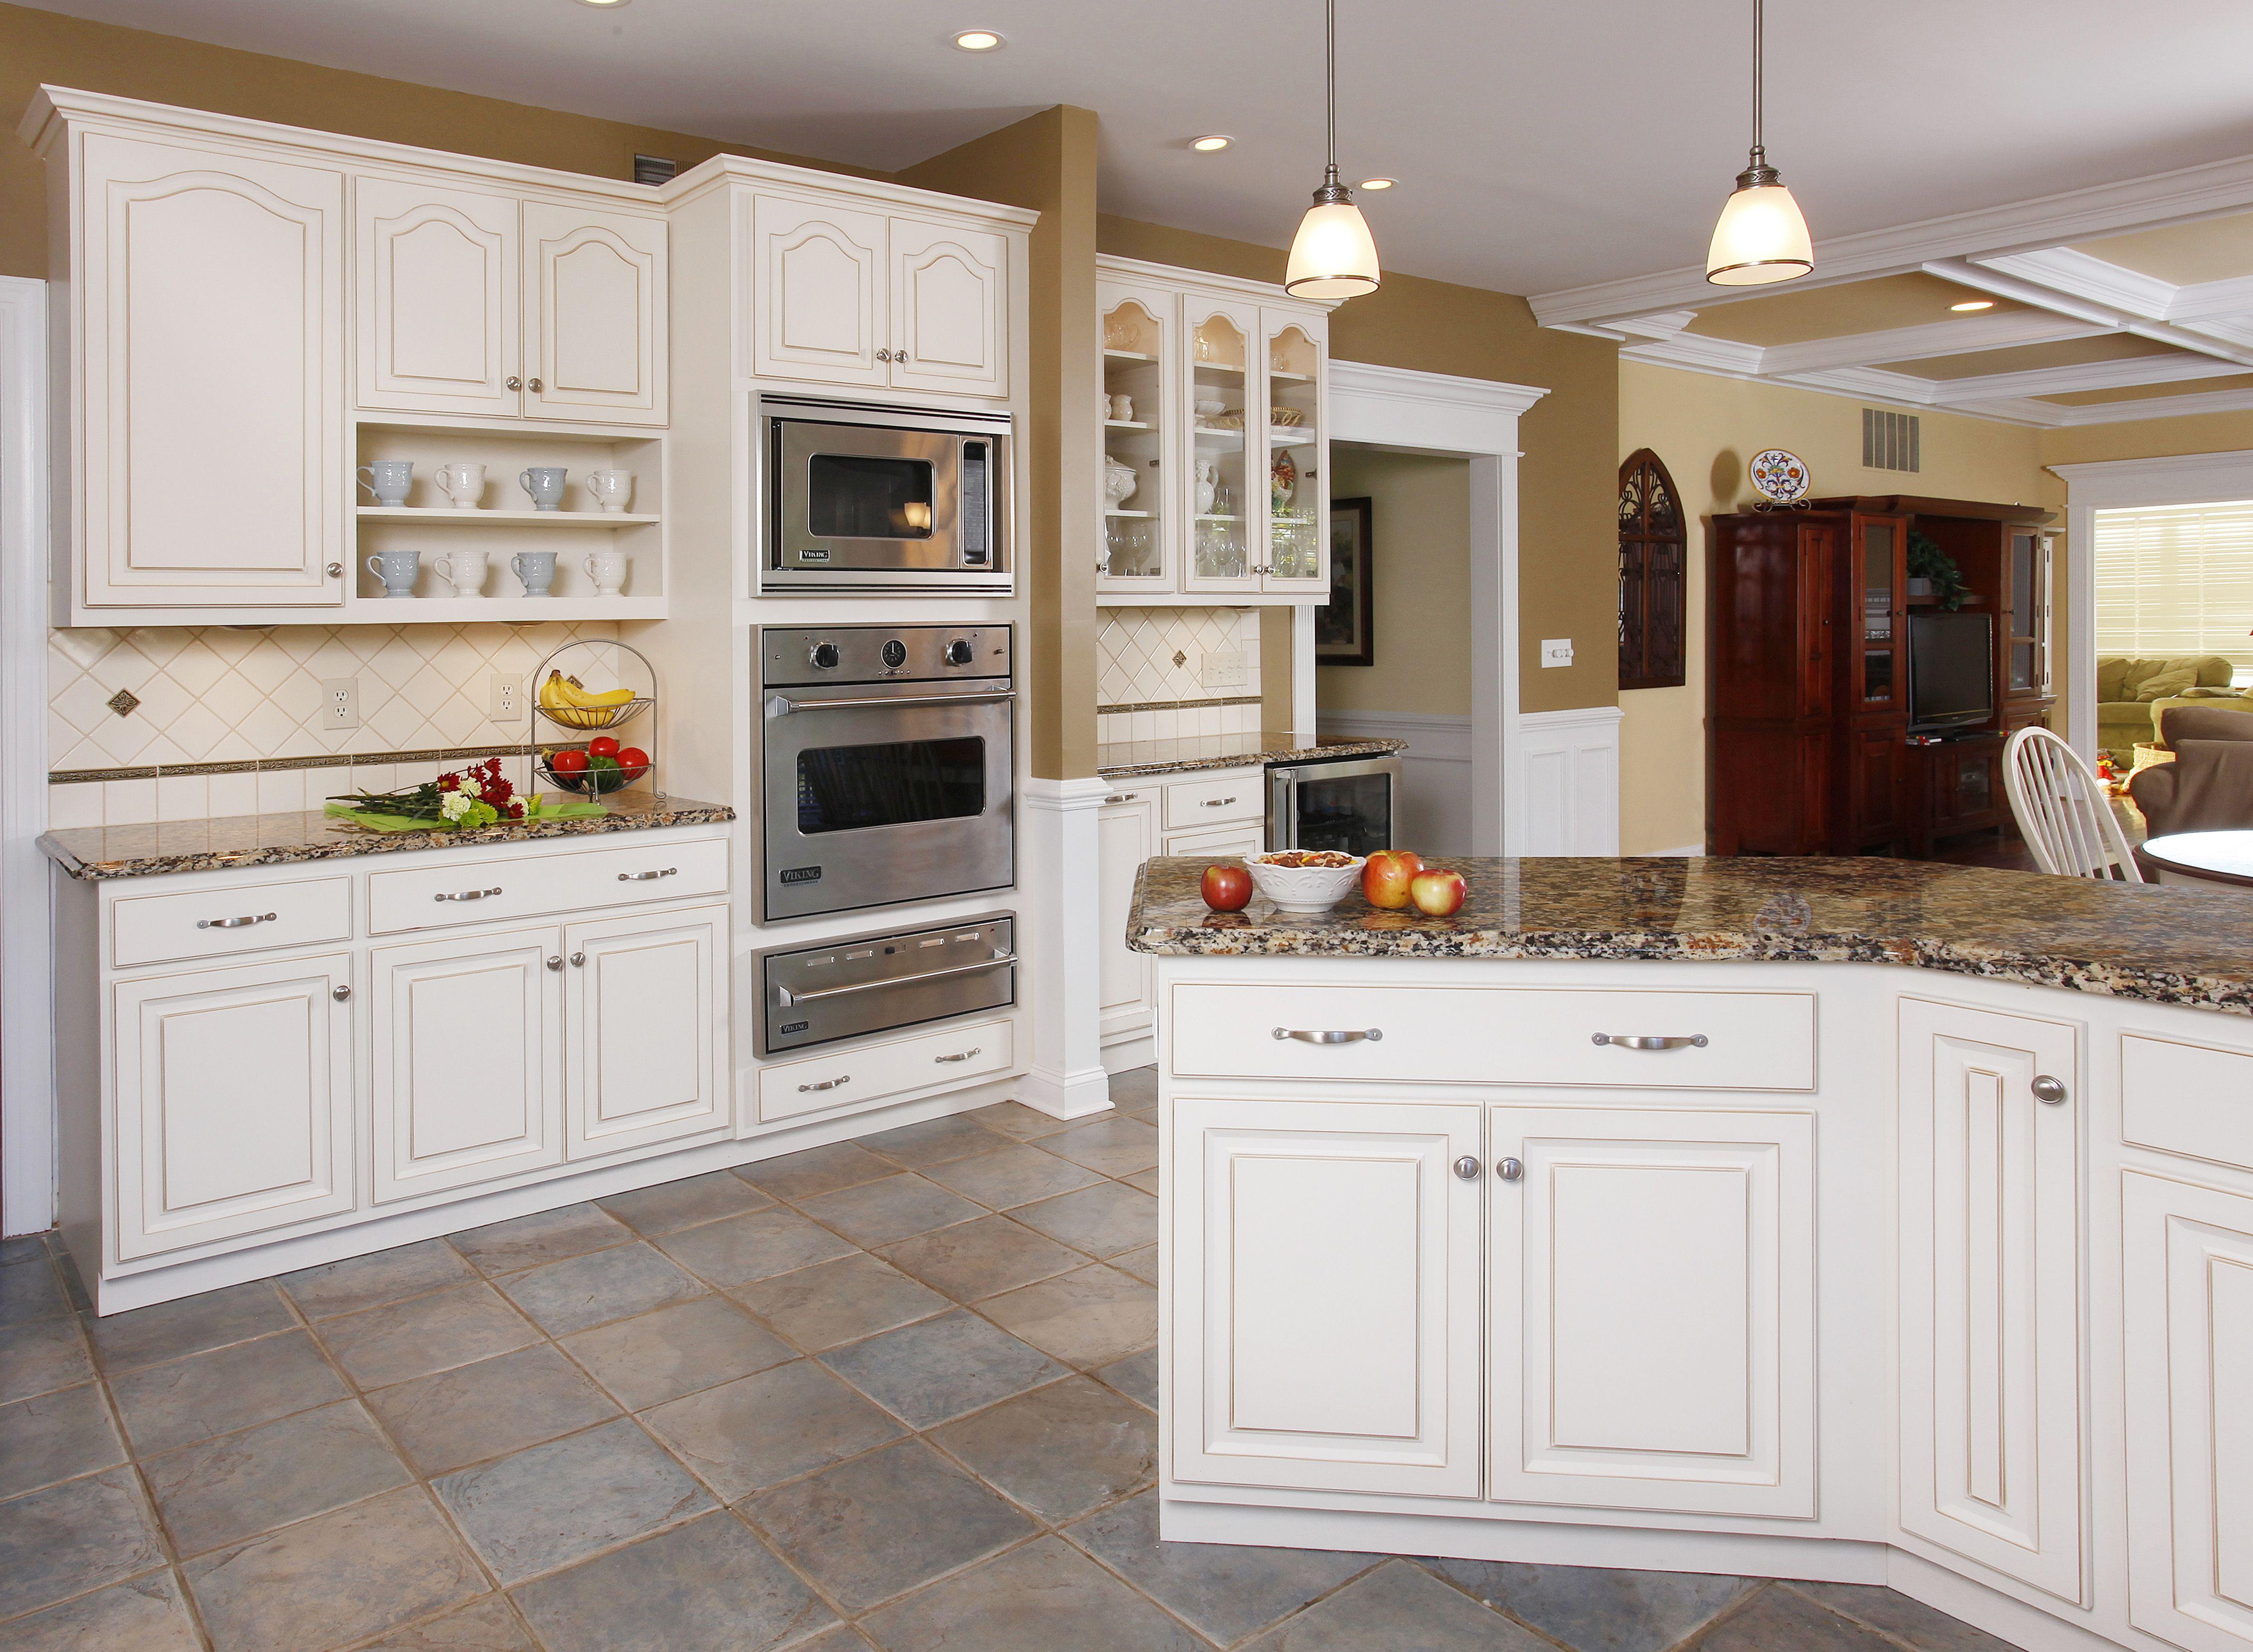 Winter White Walnut Glaze Cabinets With A Granite